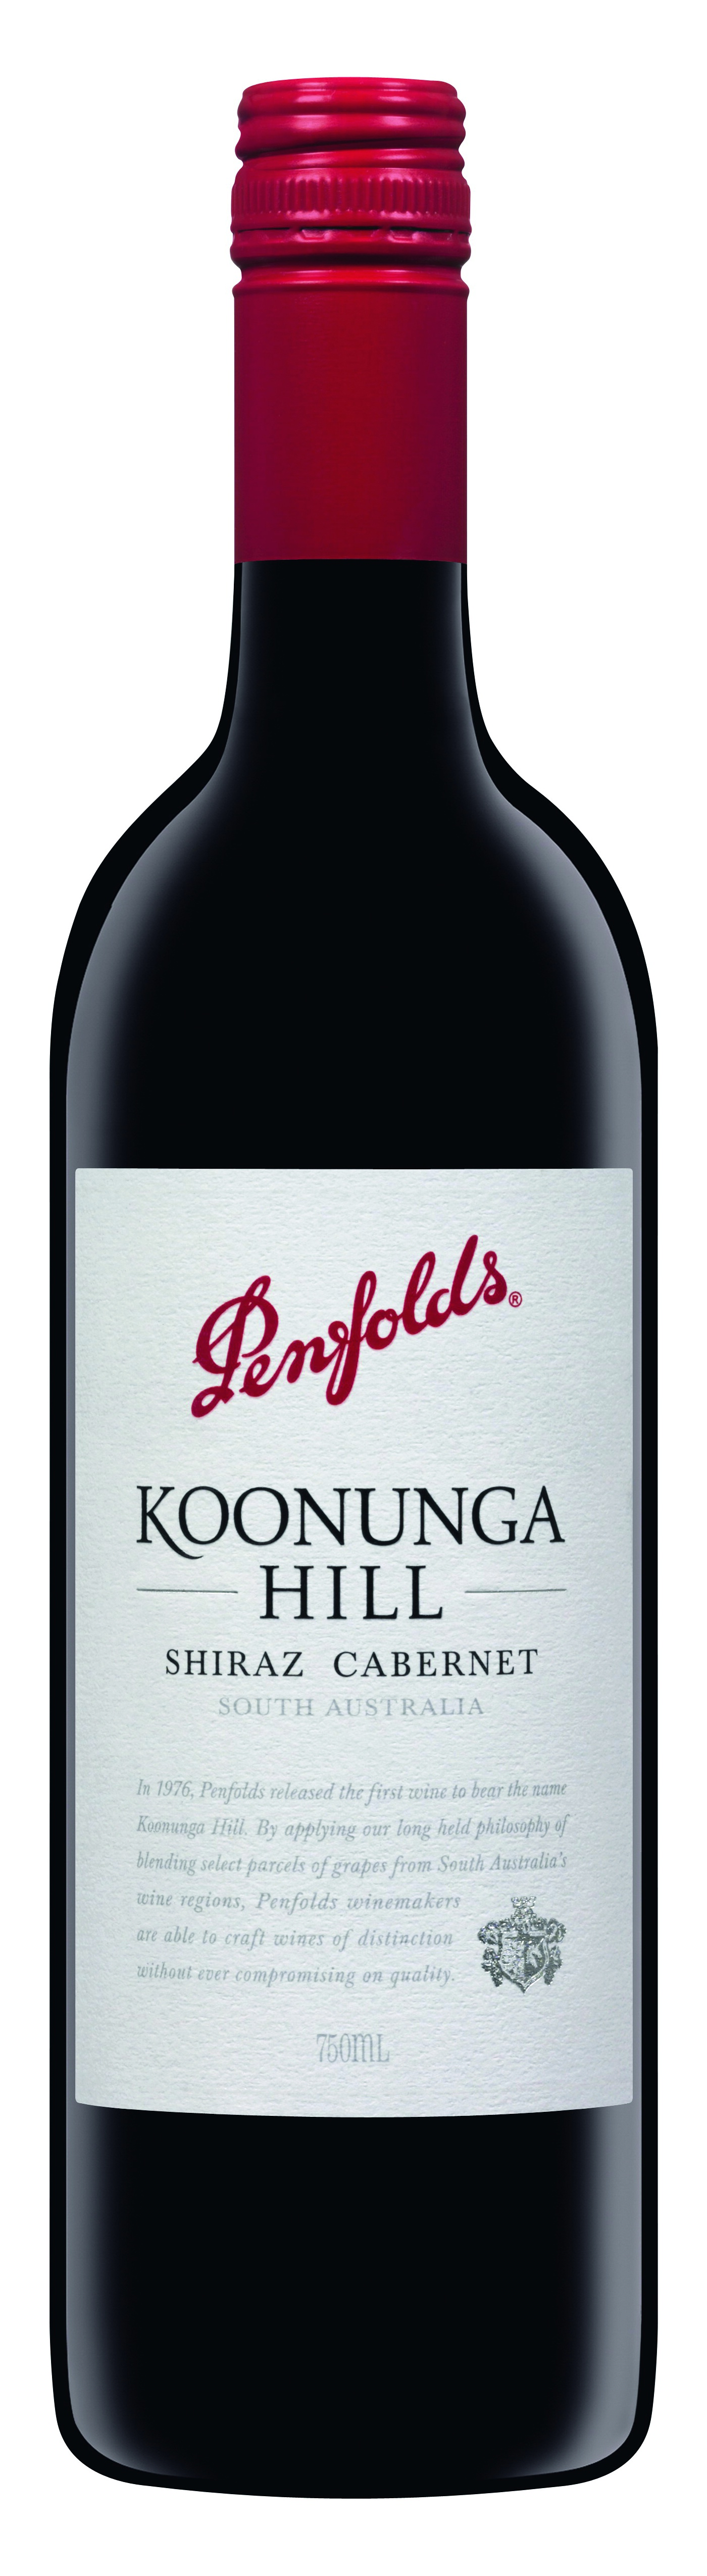 Penfolds, Koonunga Hill, Shiraz-Cabernet Sauvignon, red